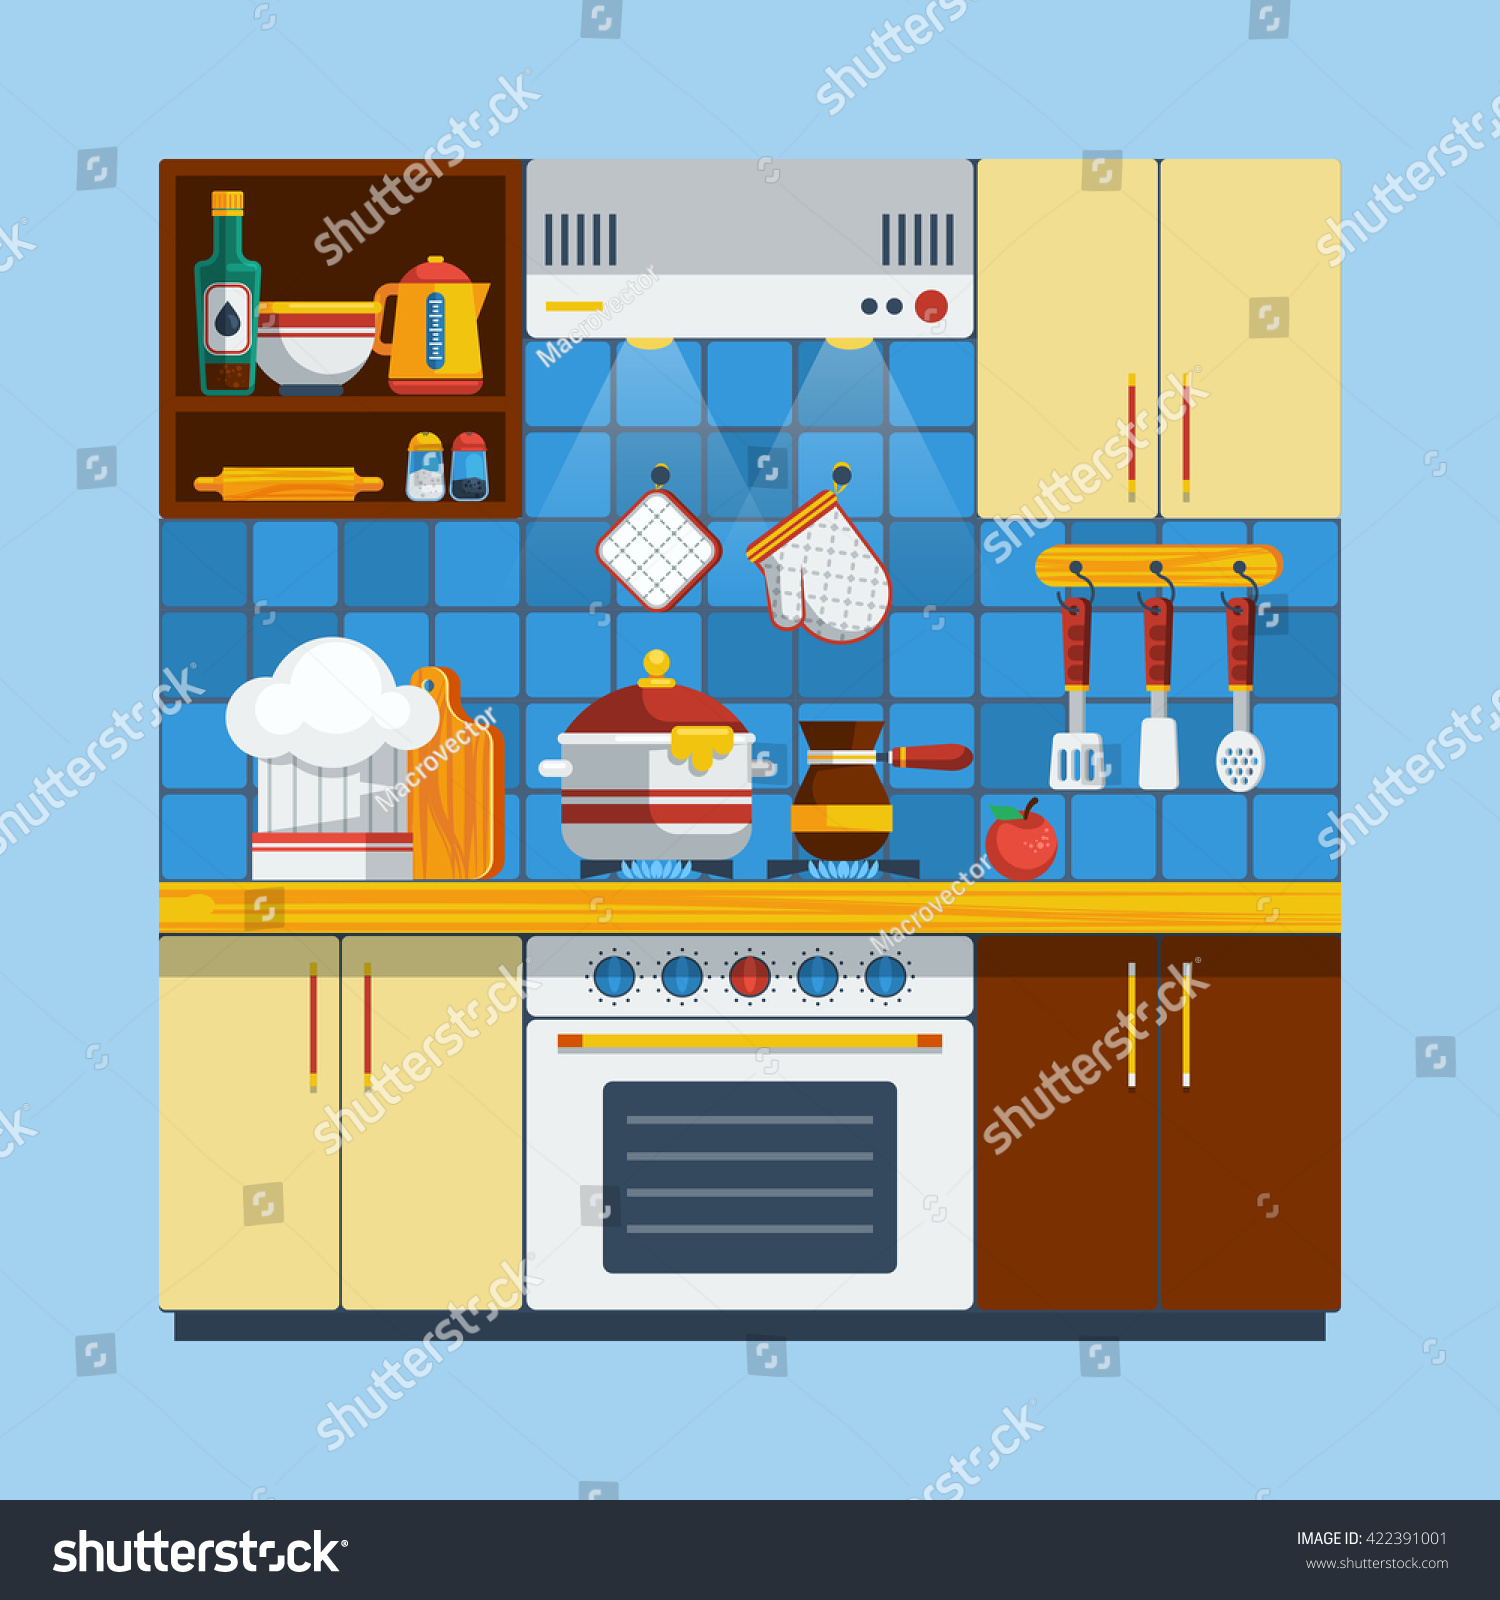 Kitchen Interior Concept Flat Cooking Symbols Stock Photo (Photo ...